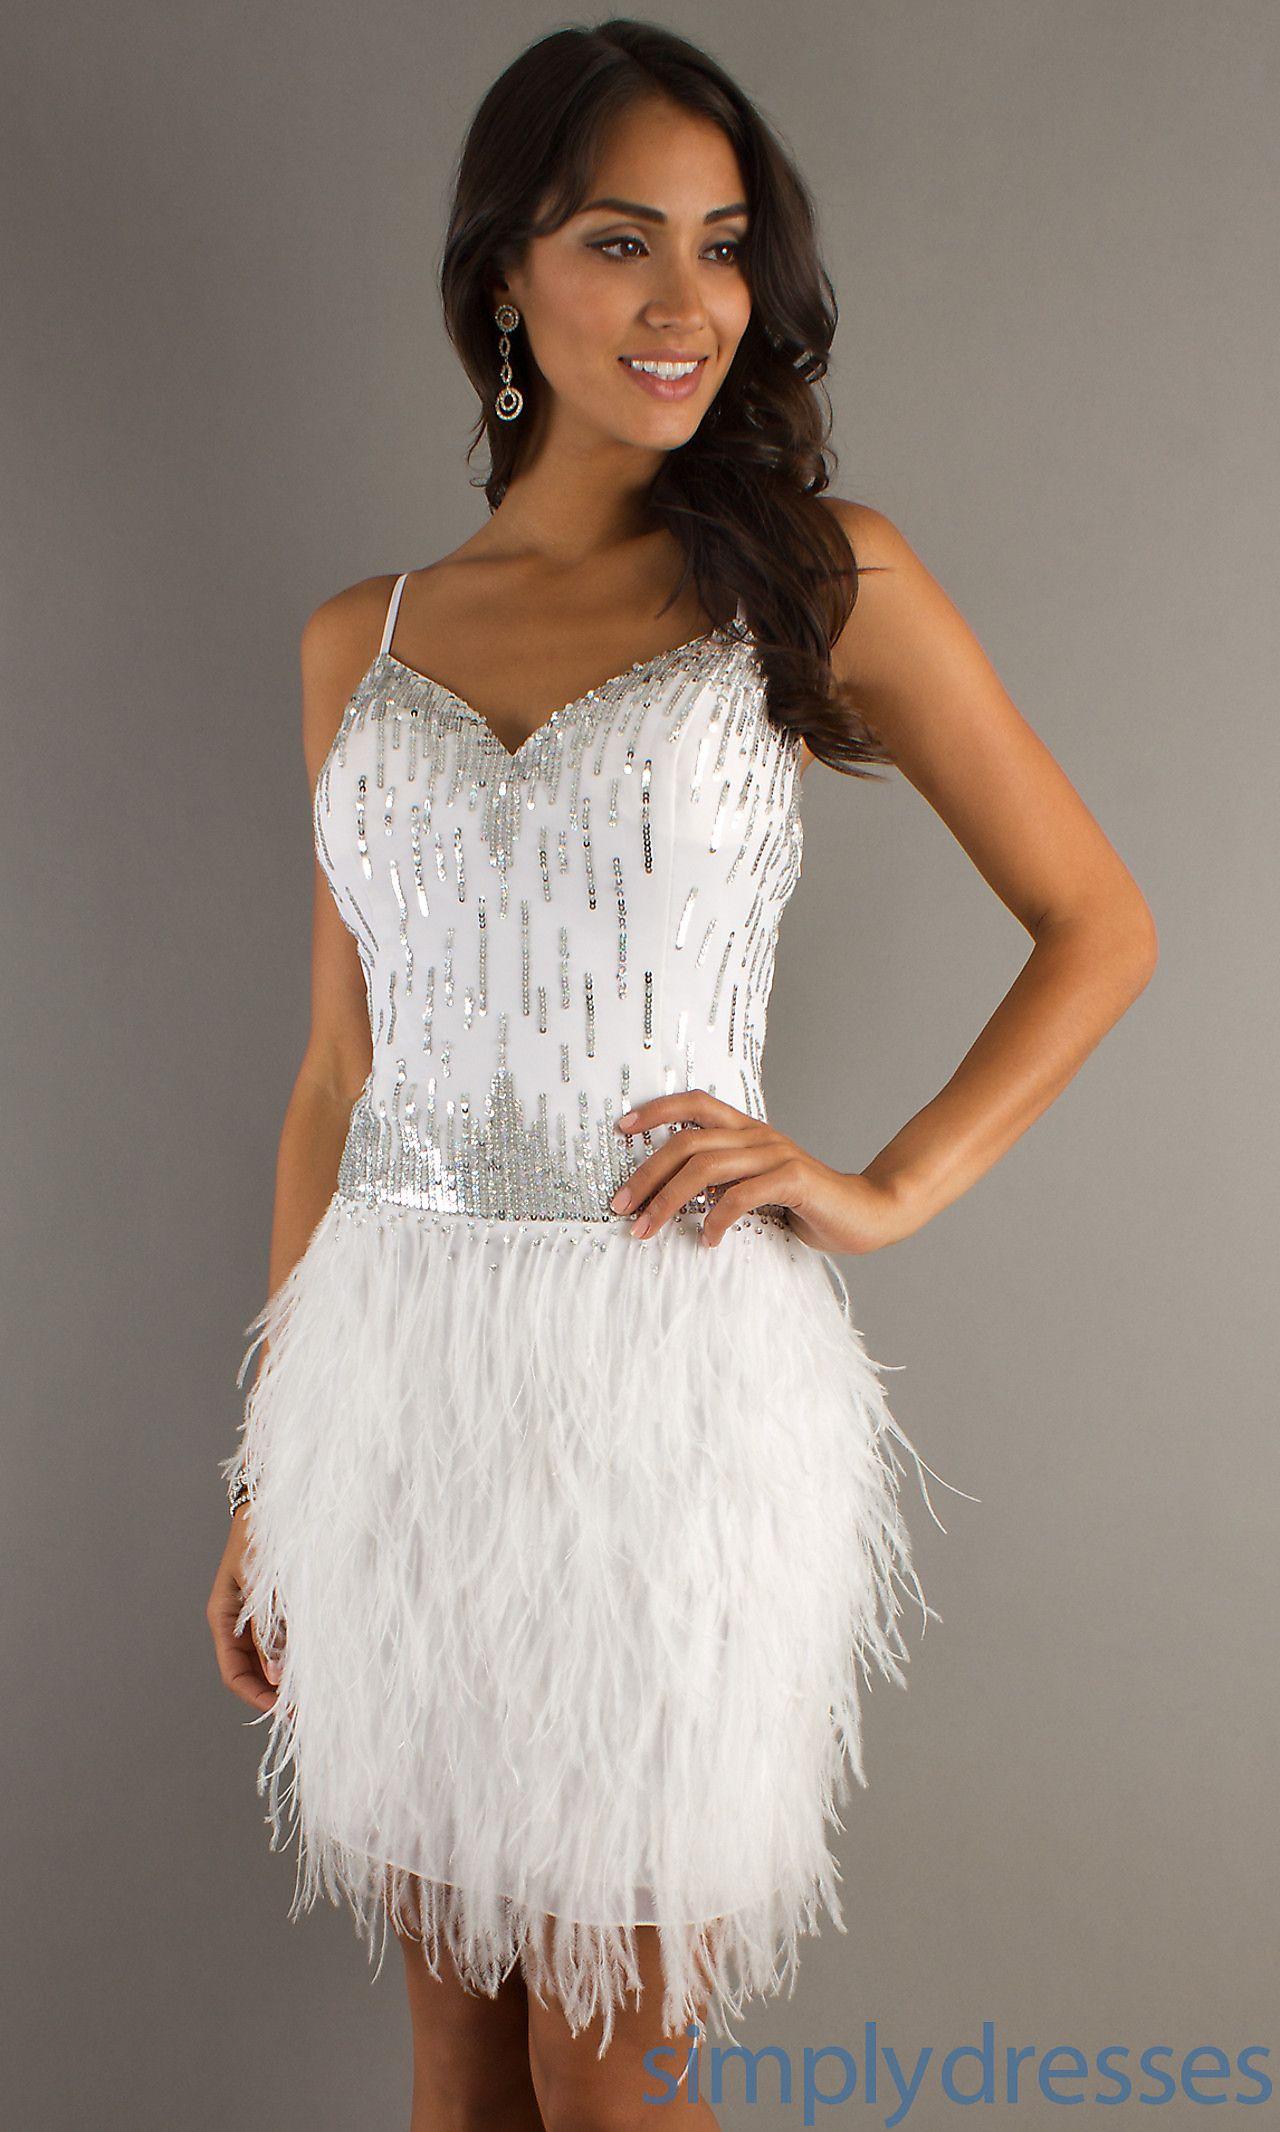 Dresses, Formal, Prom Dresses, Evening Wear: Short Spaghetti Strap ...